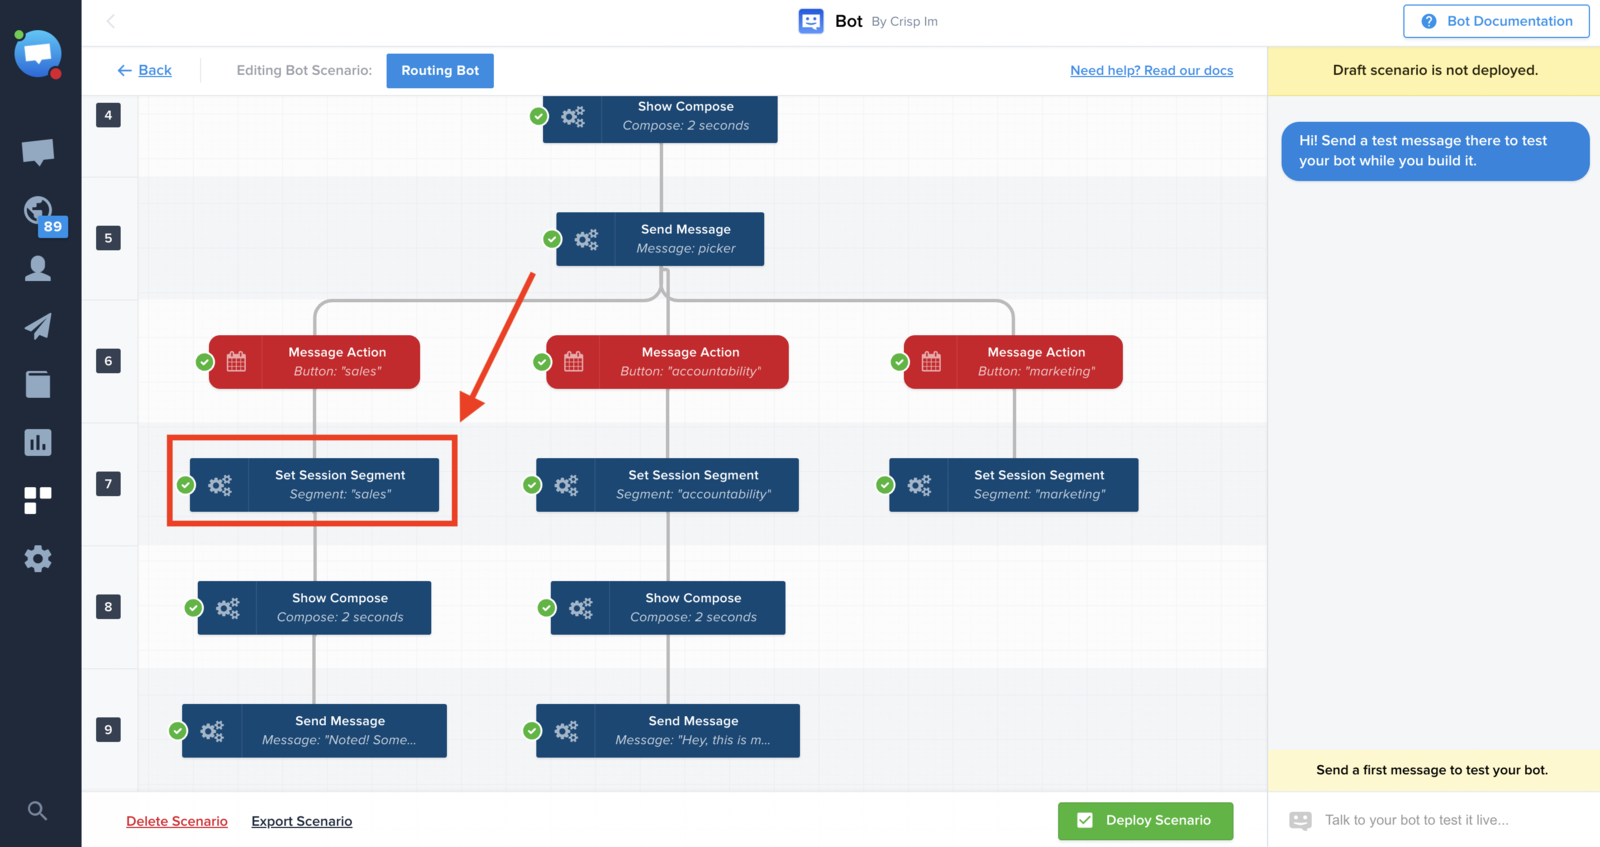 Example of a chatbot scenario having a Set Session Segment